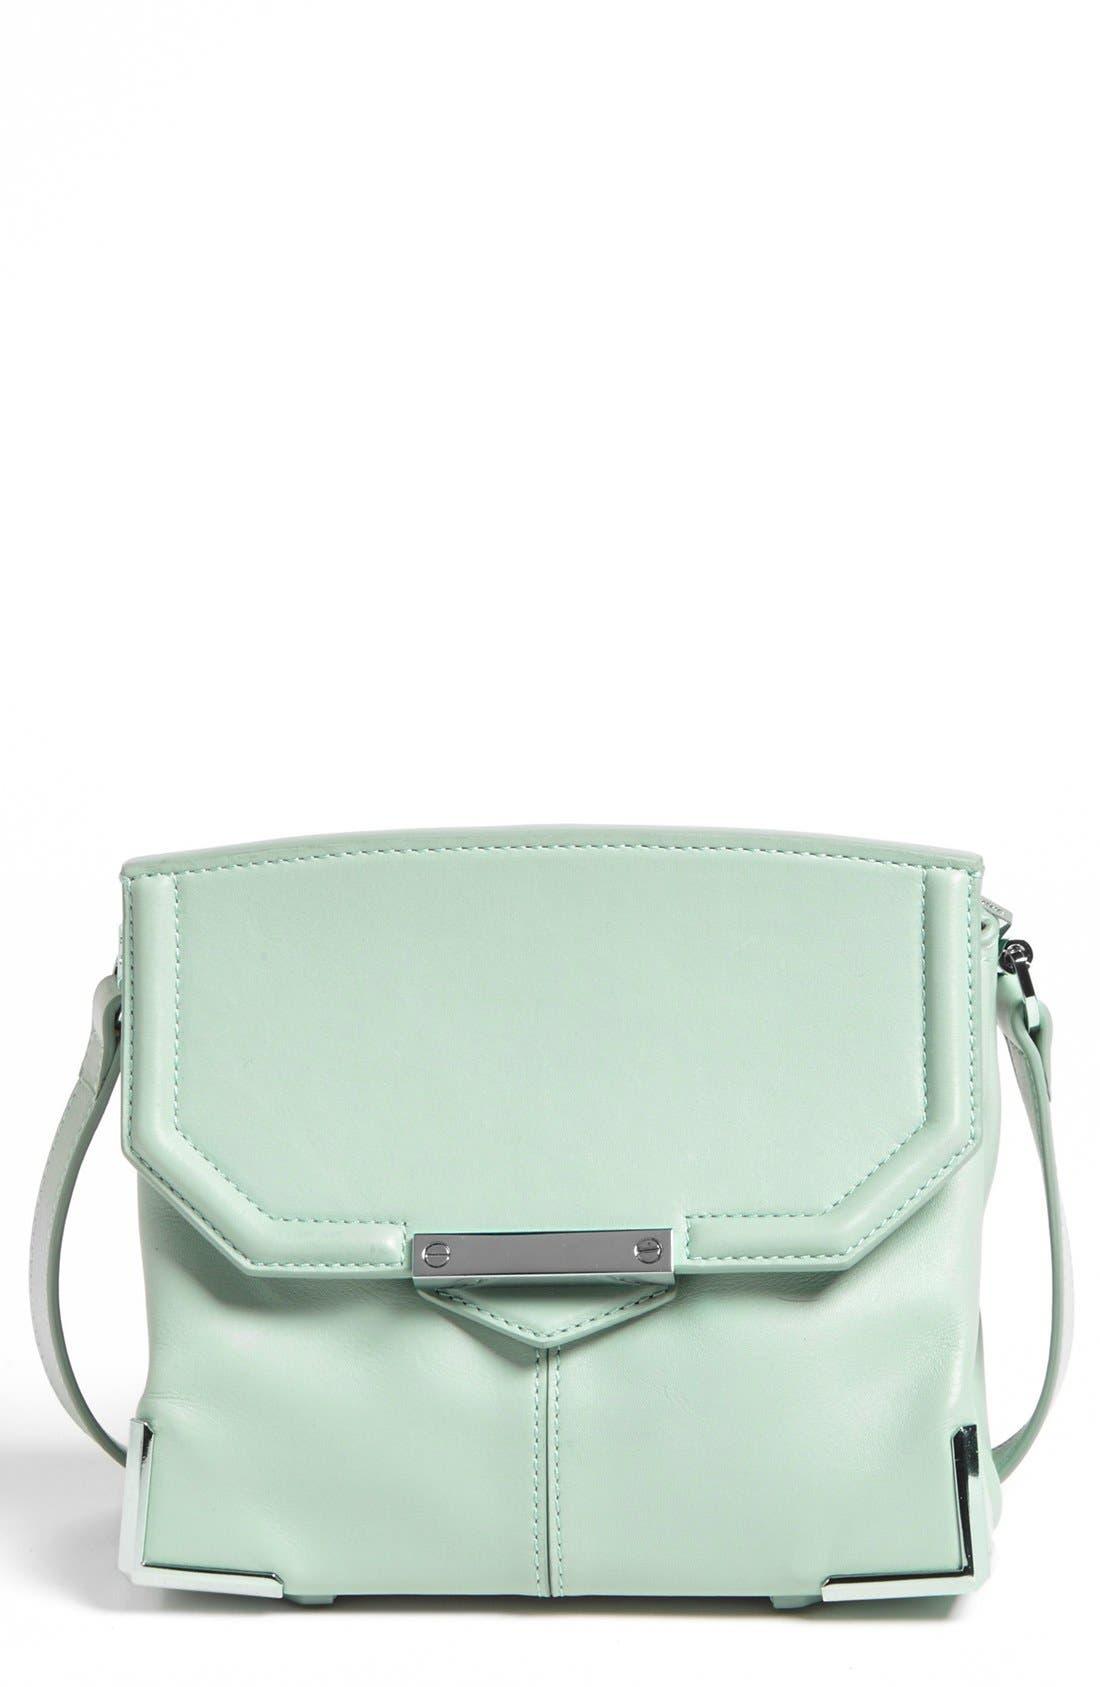 Main Image - Alexander Wang 'Marion Mini - Prisma' Leather Crossbody Bag